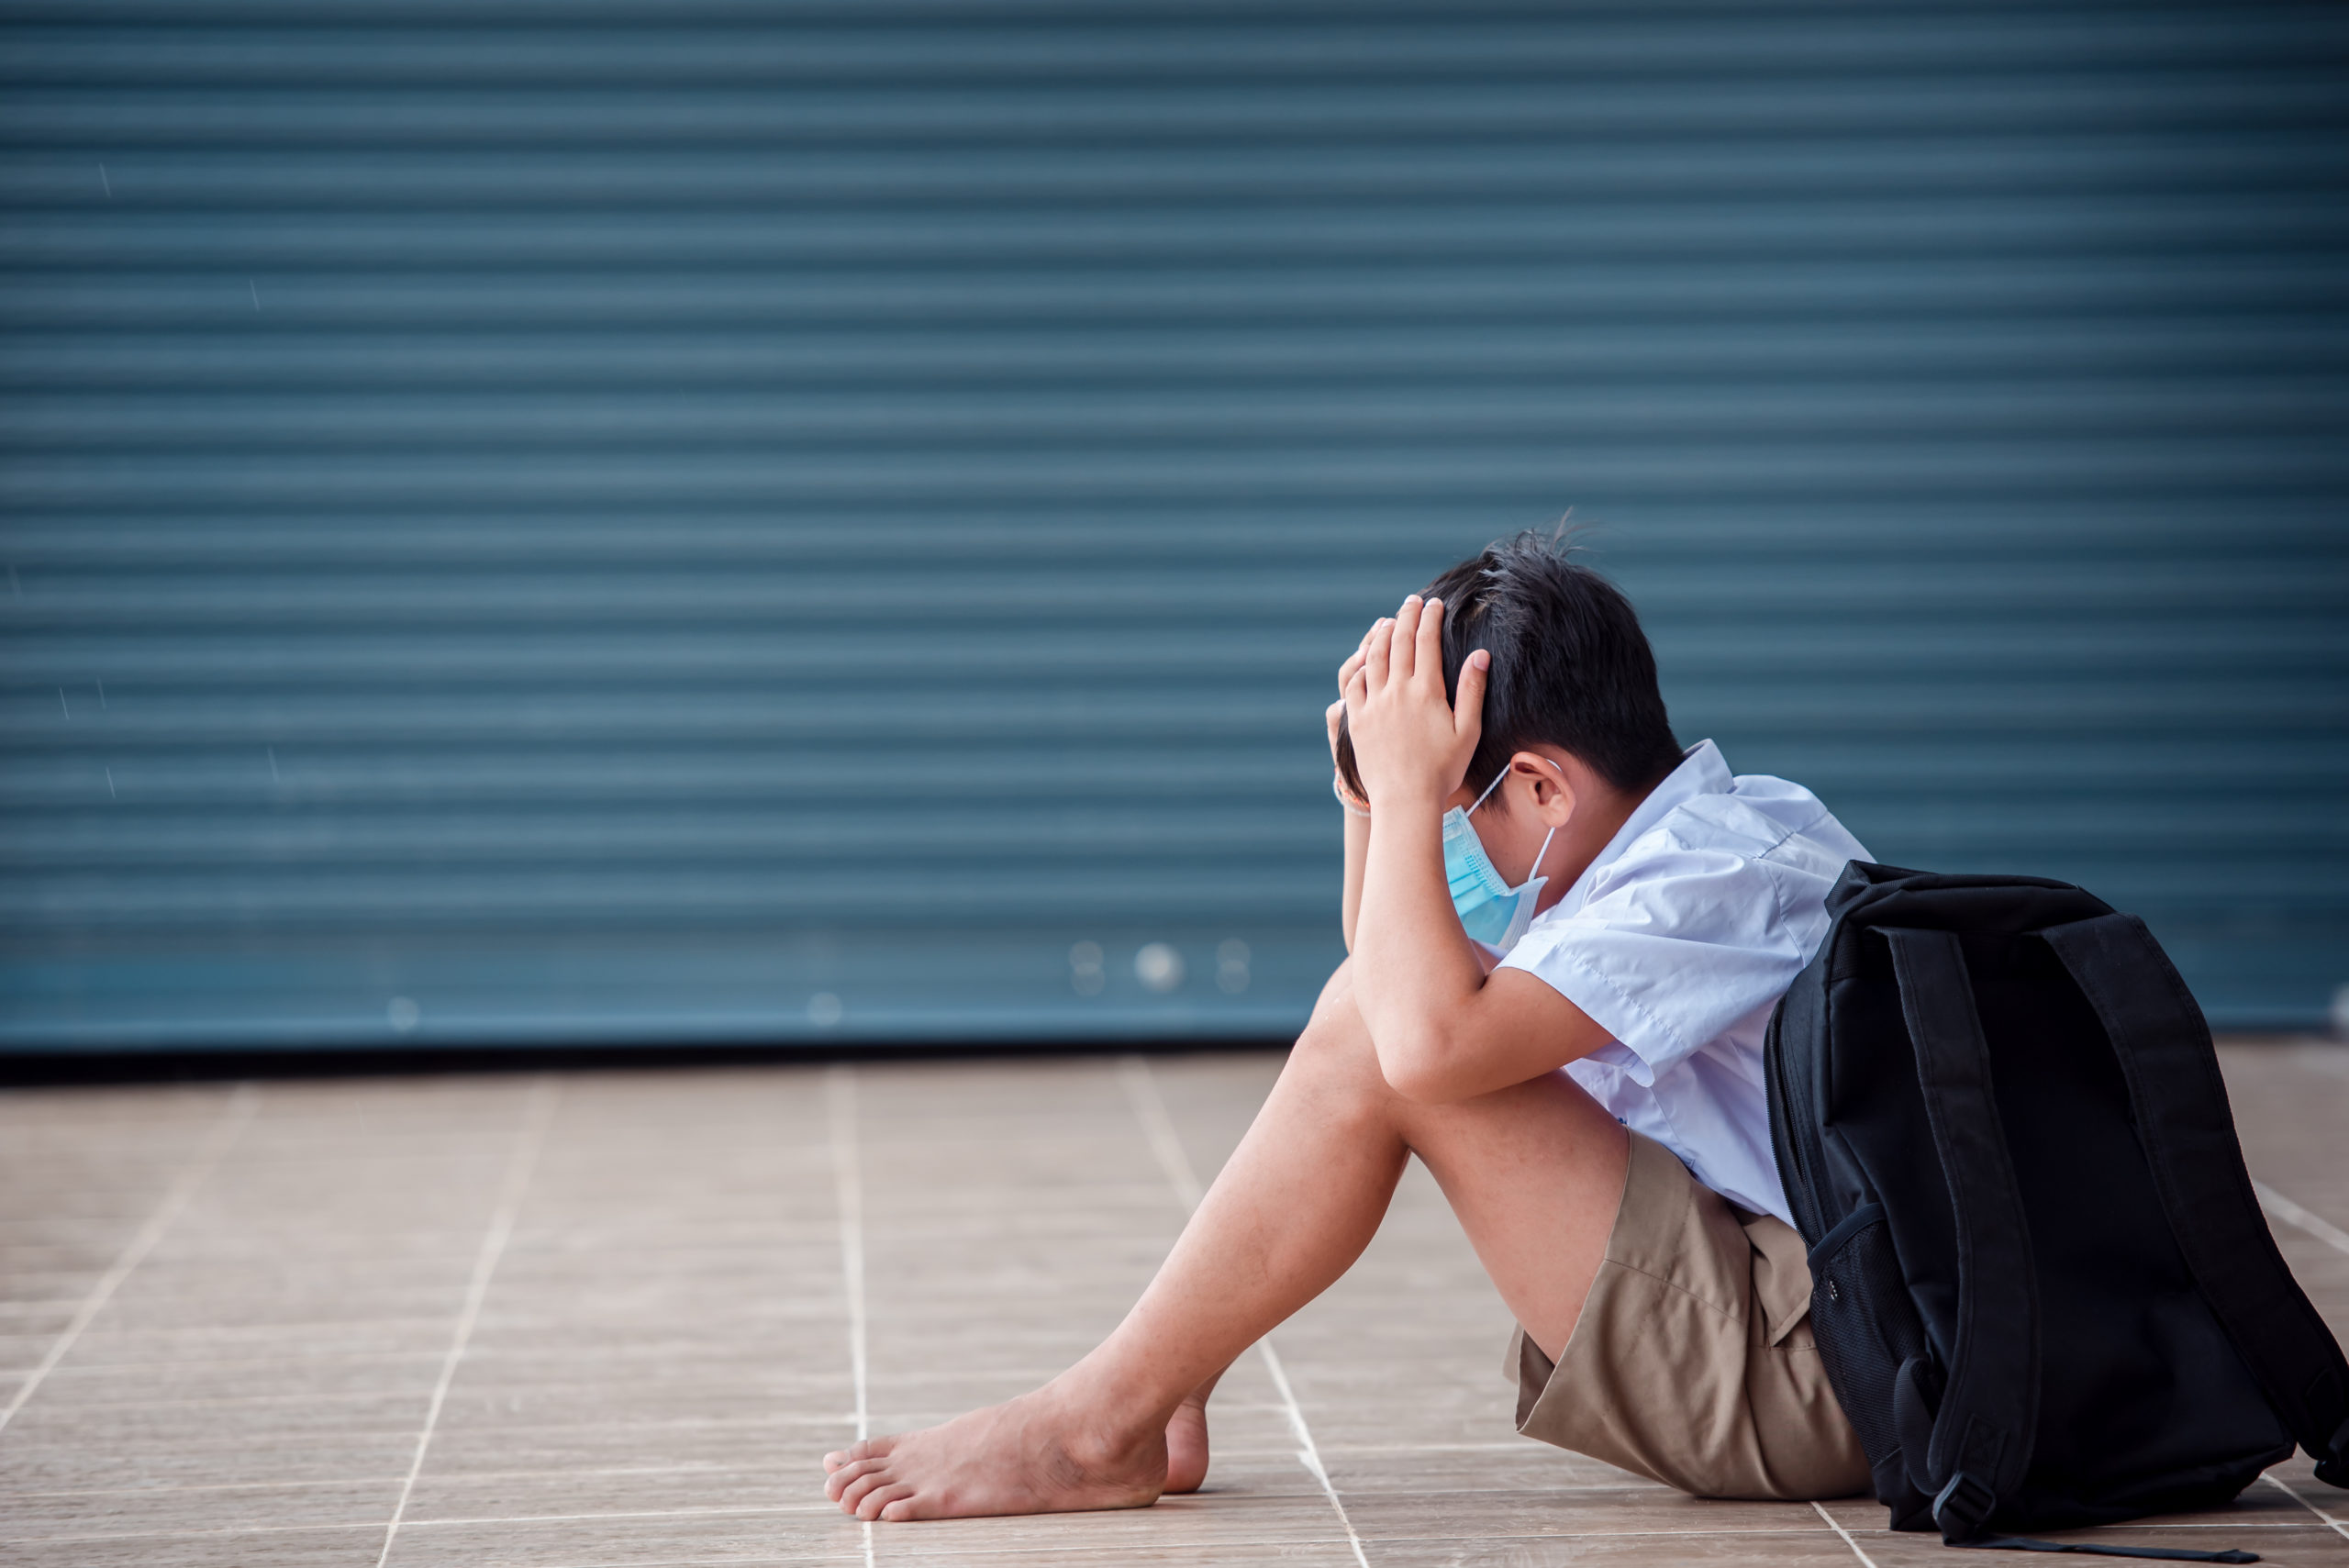 Elementary school asian school children Wearing a medical mask Sad sitting at school